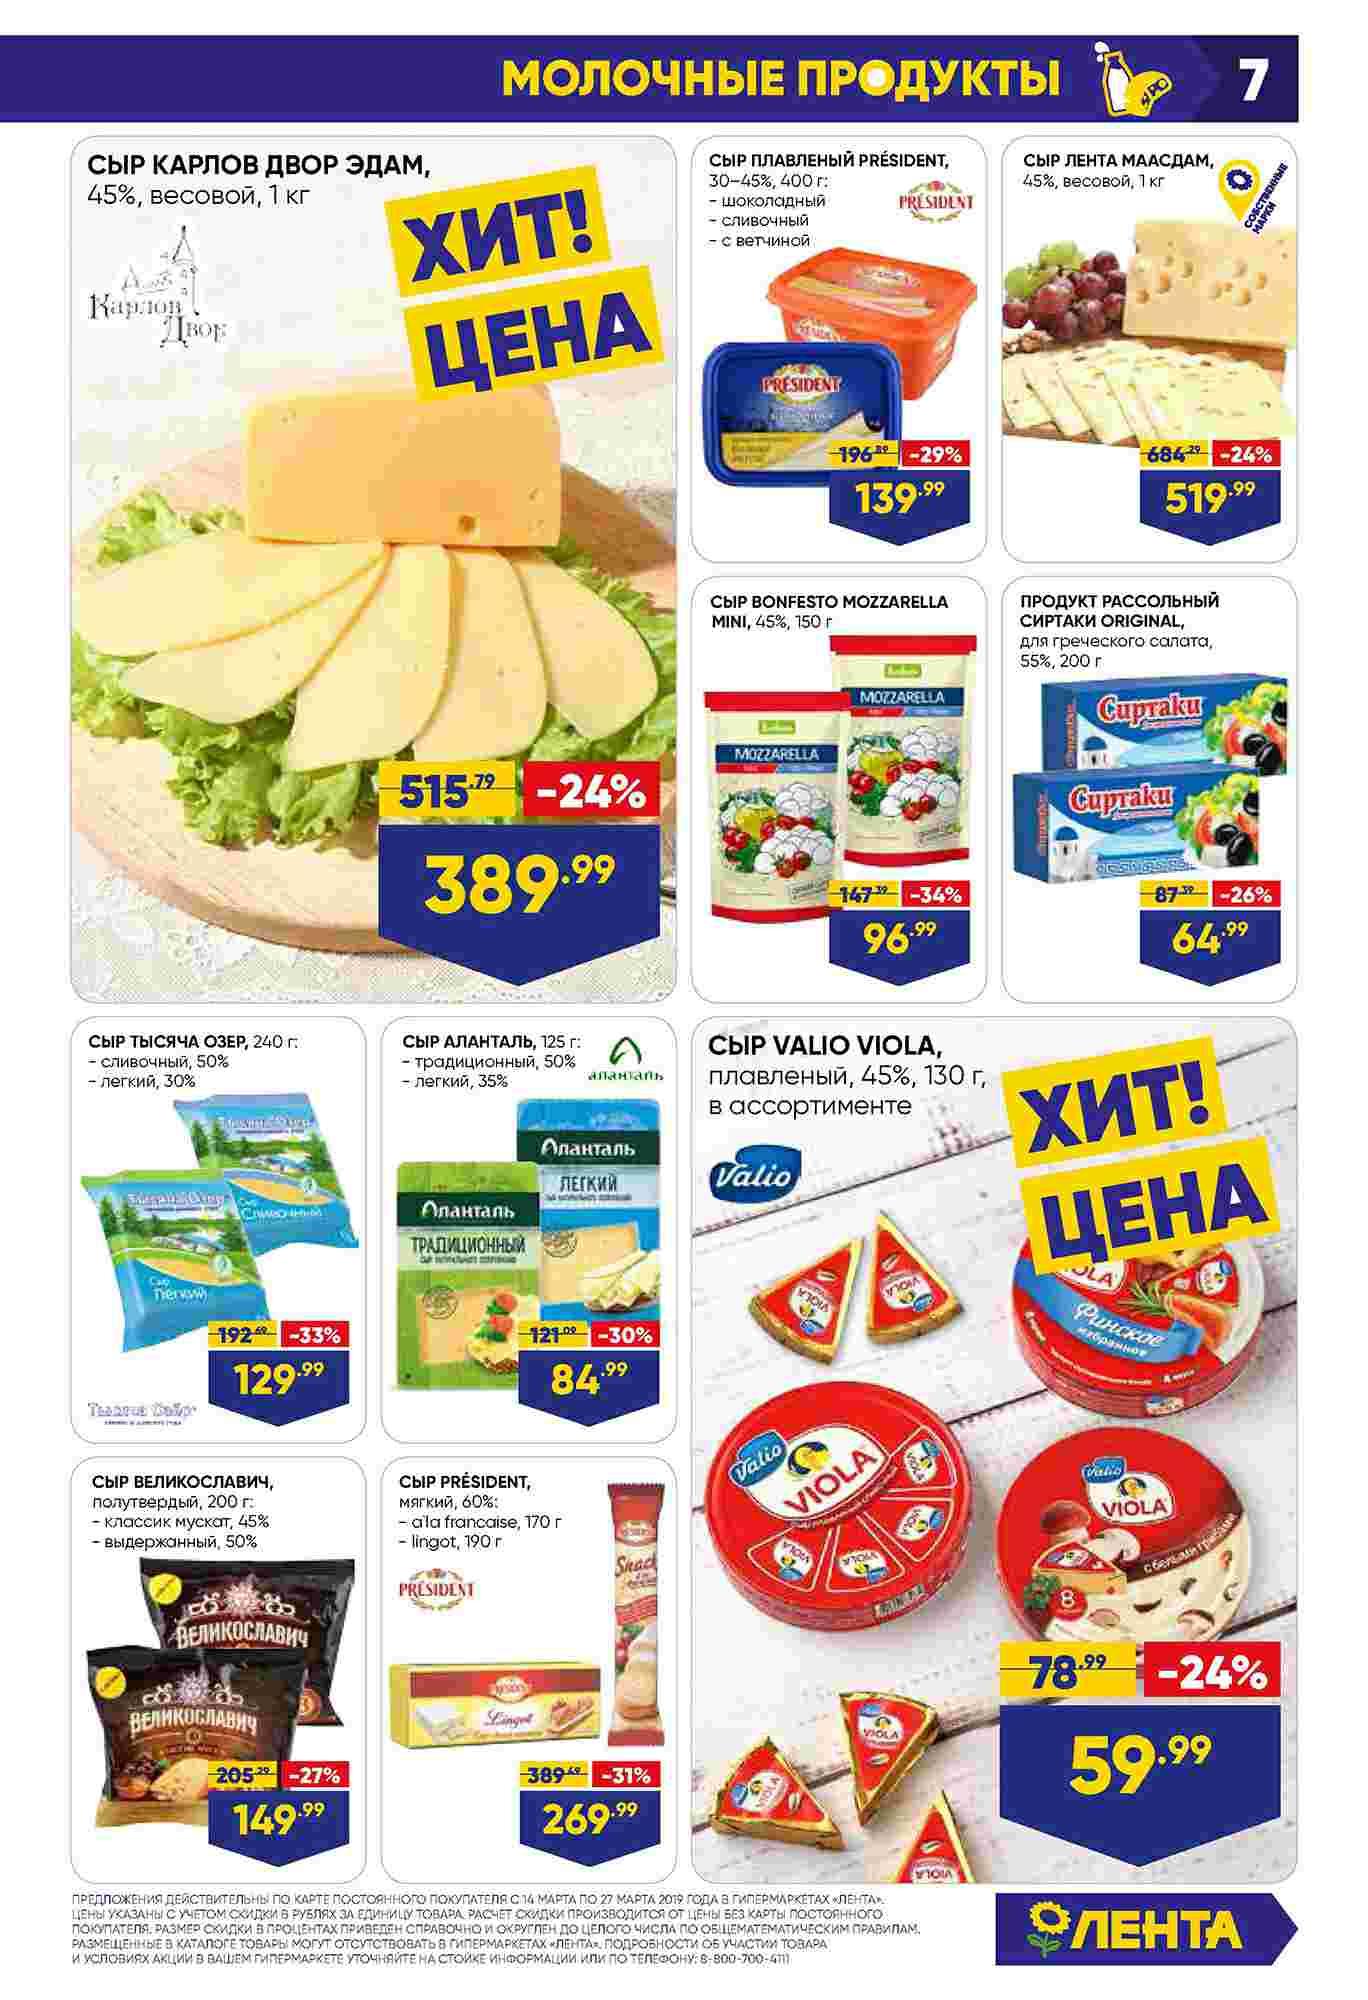 Каталог Лента гипермаркет 14-27.03.2019 стр. - 0001 - 0007